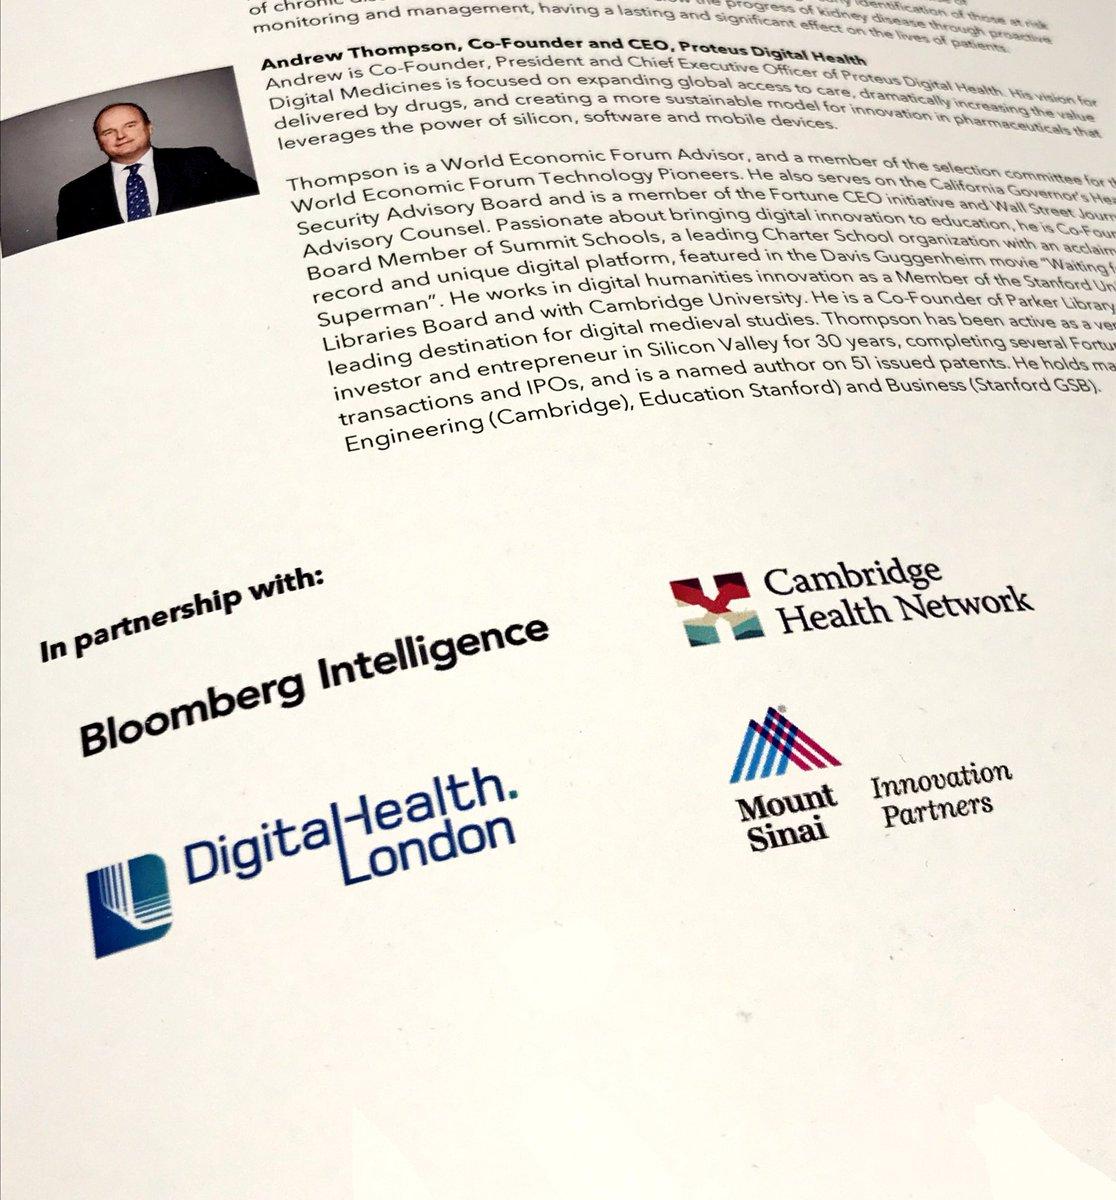 Cambridge Health Network (@CamHNet) | Twitter